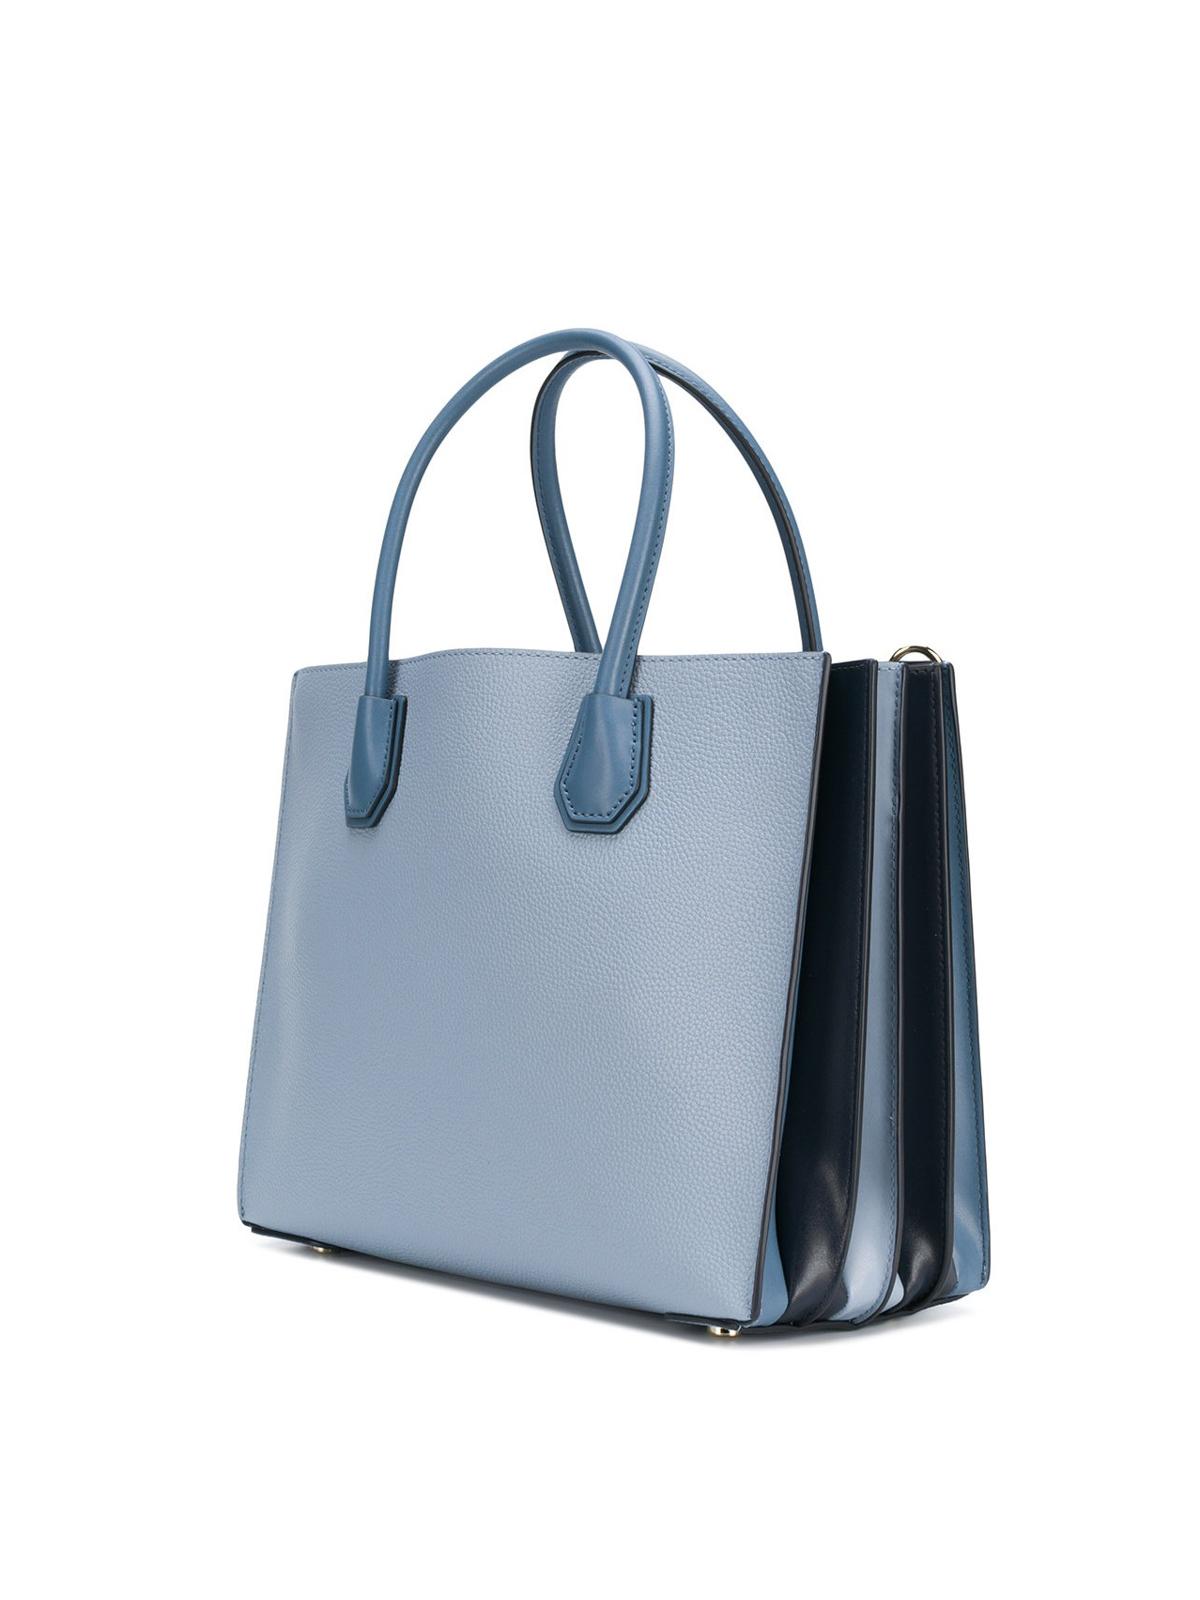 iKRIX MICHAEL KORS  totes bags - Mercer large light blue accordion tote 0410862c11dab